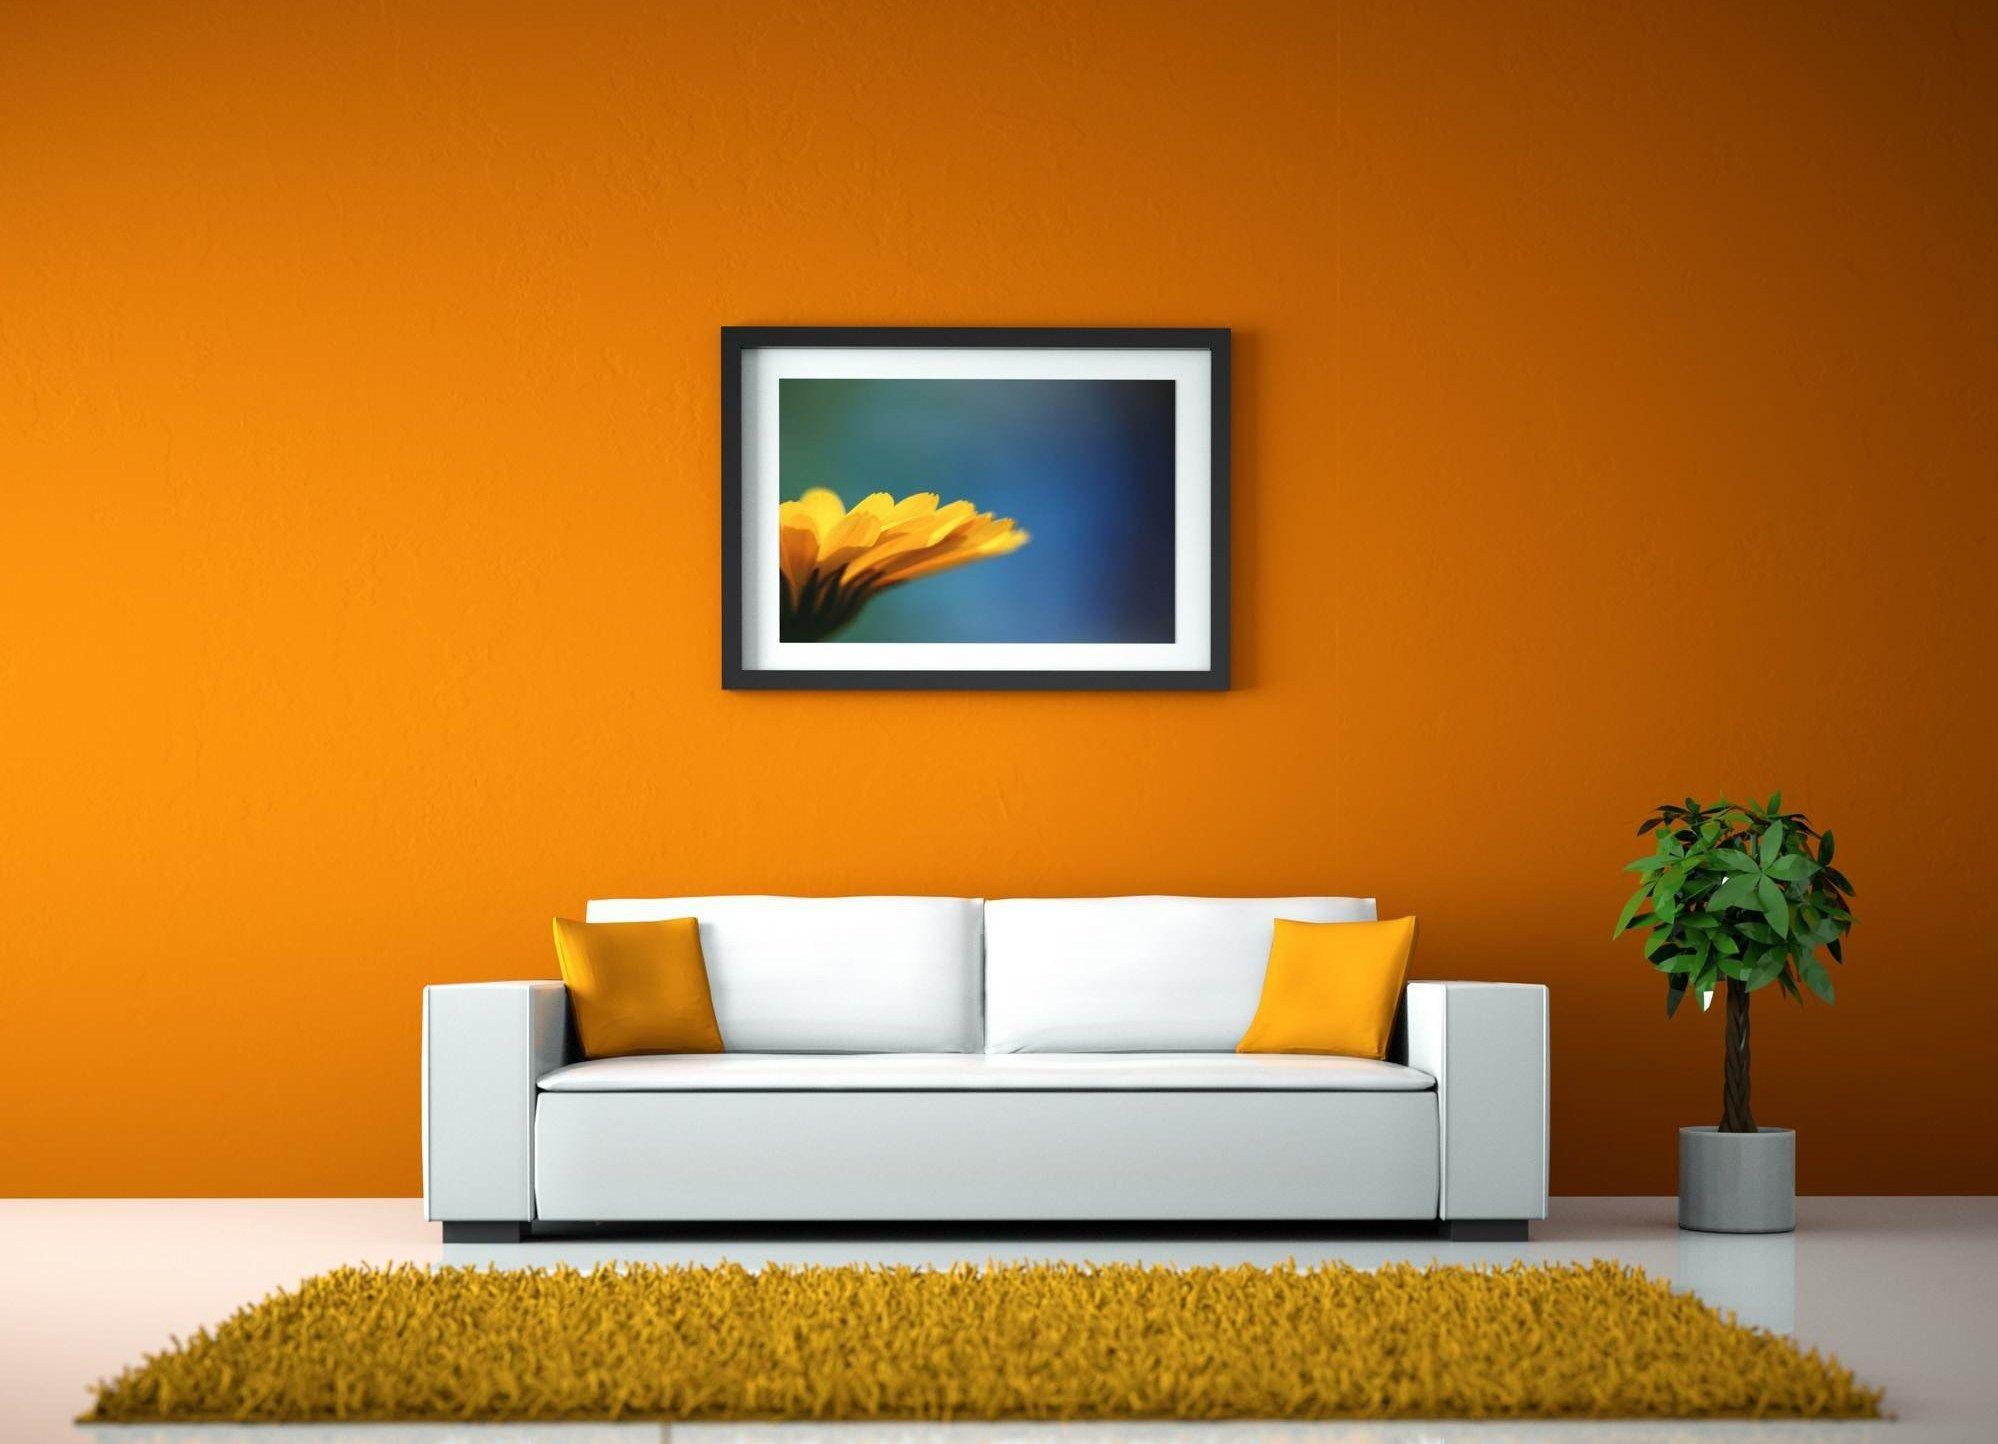 Best Color for Living Room Walls